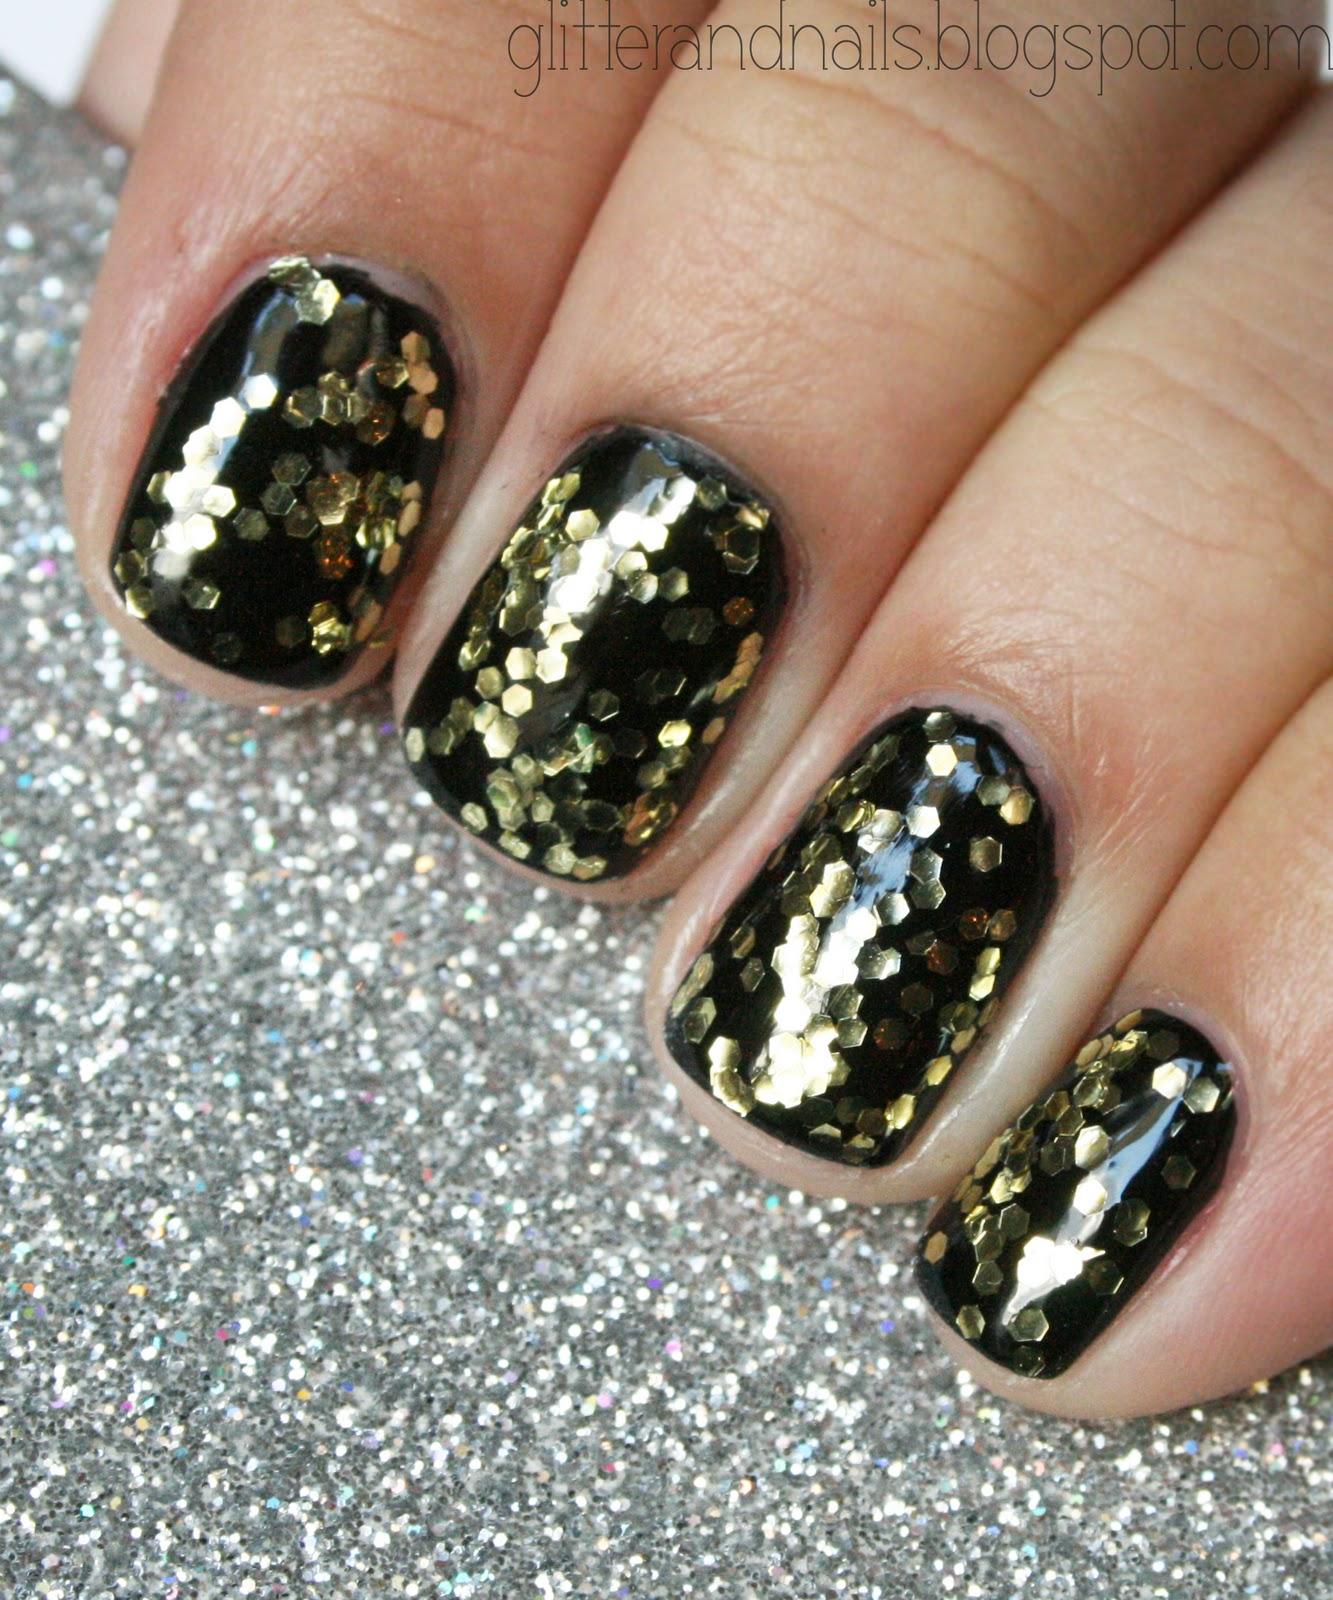 http://1.bp.blogspot.com/-Pz5HK5mJUUE/TvWyyZs4smI/AAAAAAAAB1s/Re5NxWob358/s1600/Sinful-Color-Black-%252B-Milani-Gold.jpg